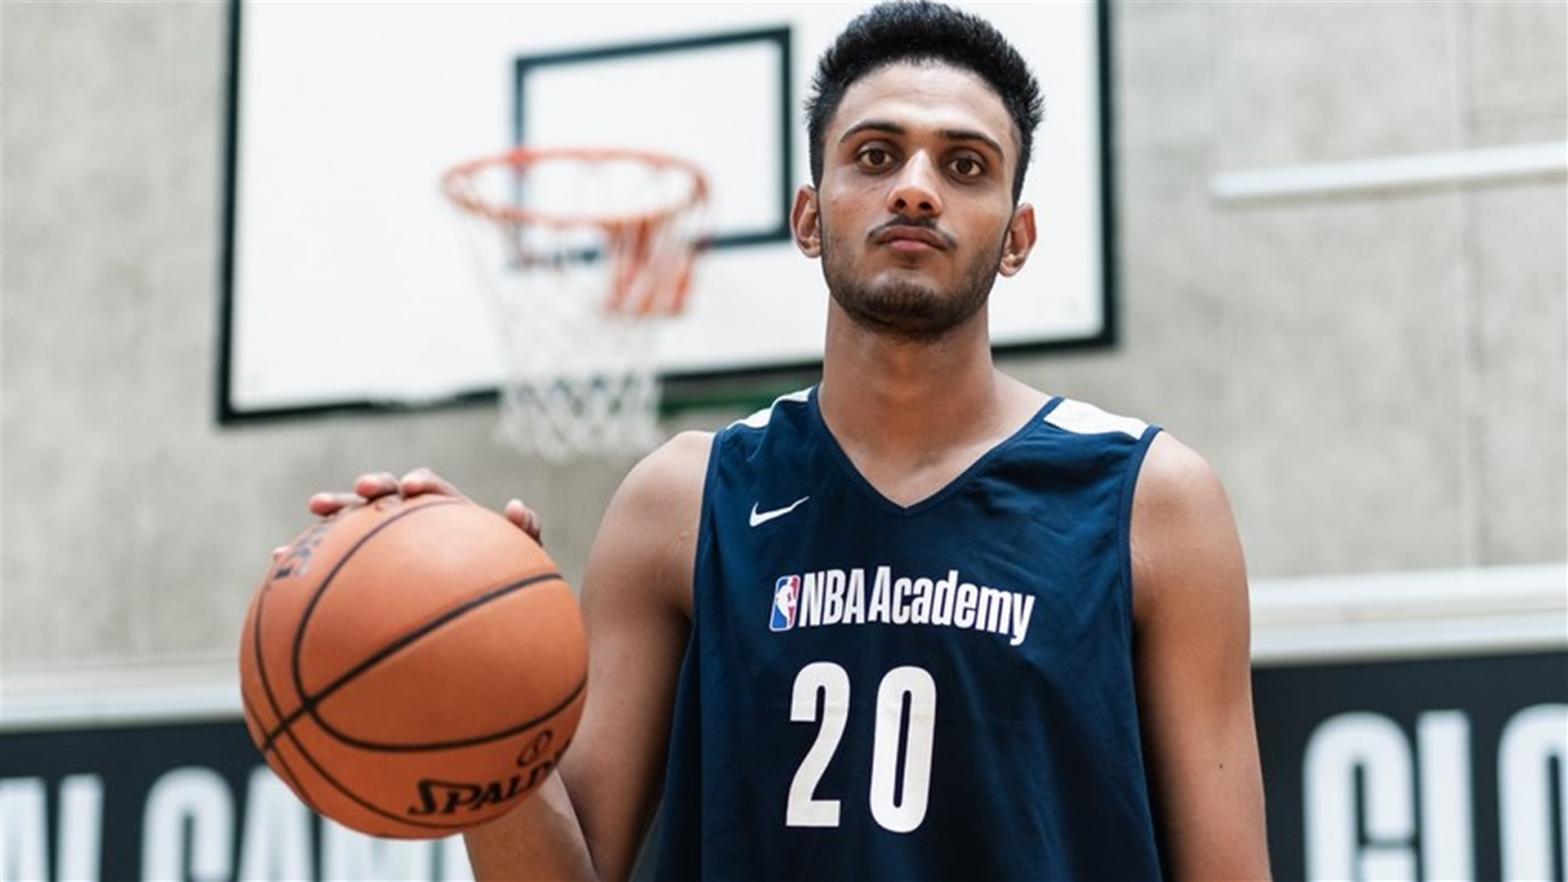 Princepal Singh becomes first Indian to be part of NBA championship roster  പ്രിൻസ്പാൽ സിംഗ് NBA ചാമ്പ്യൻഷിപ്പ് പട്ടികയിൽ ഉൾപ്പെടുന്ന ആദ്യ ഇന്ത്യക്കാരനായി_40.1